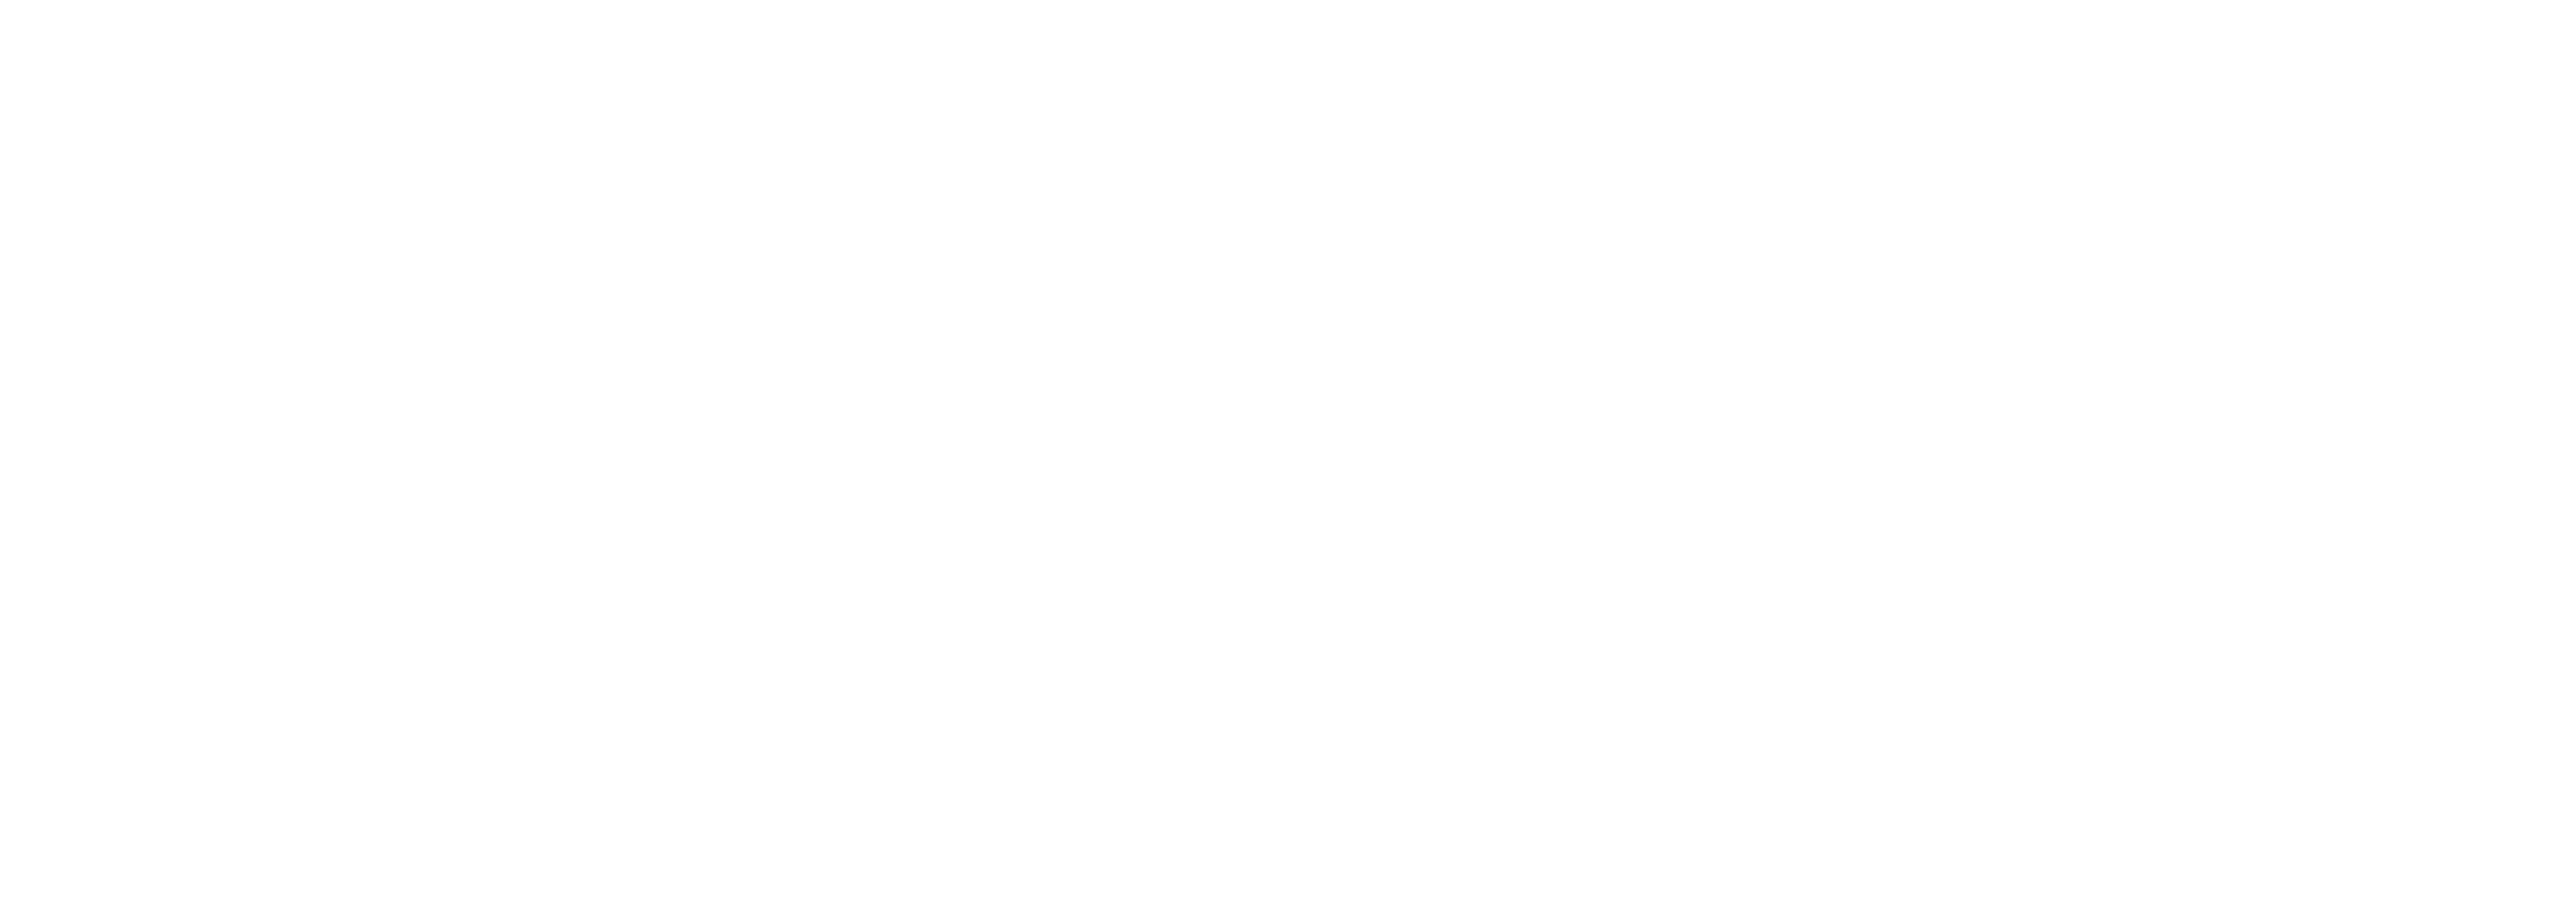 Women in Wealth Management Awards 2019